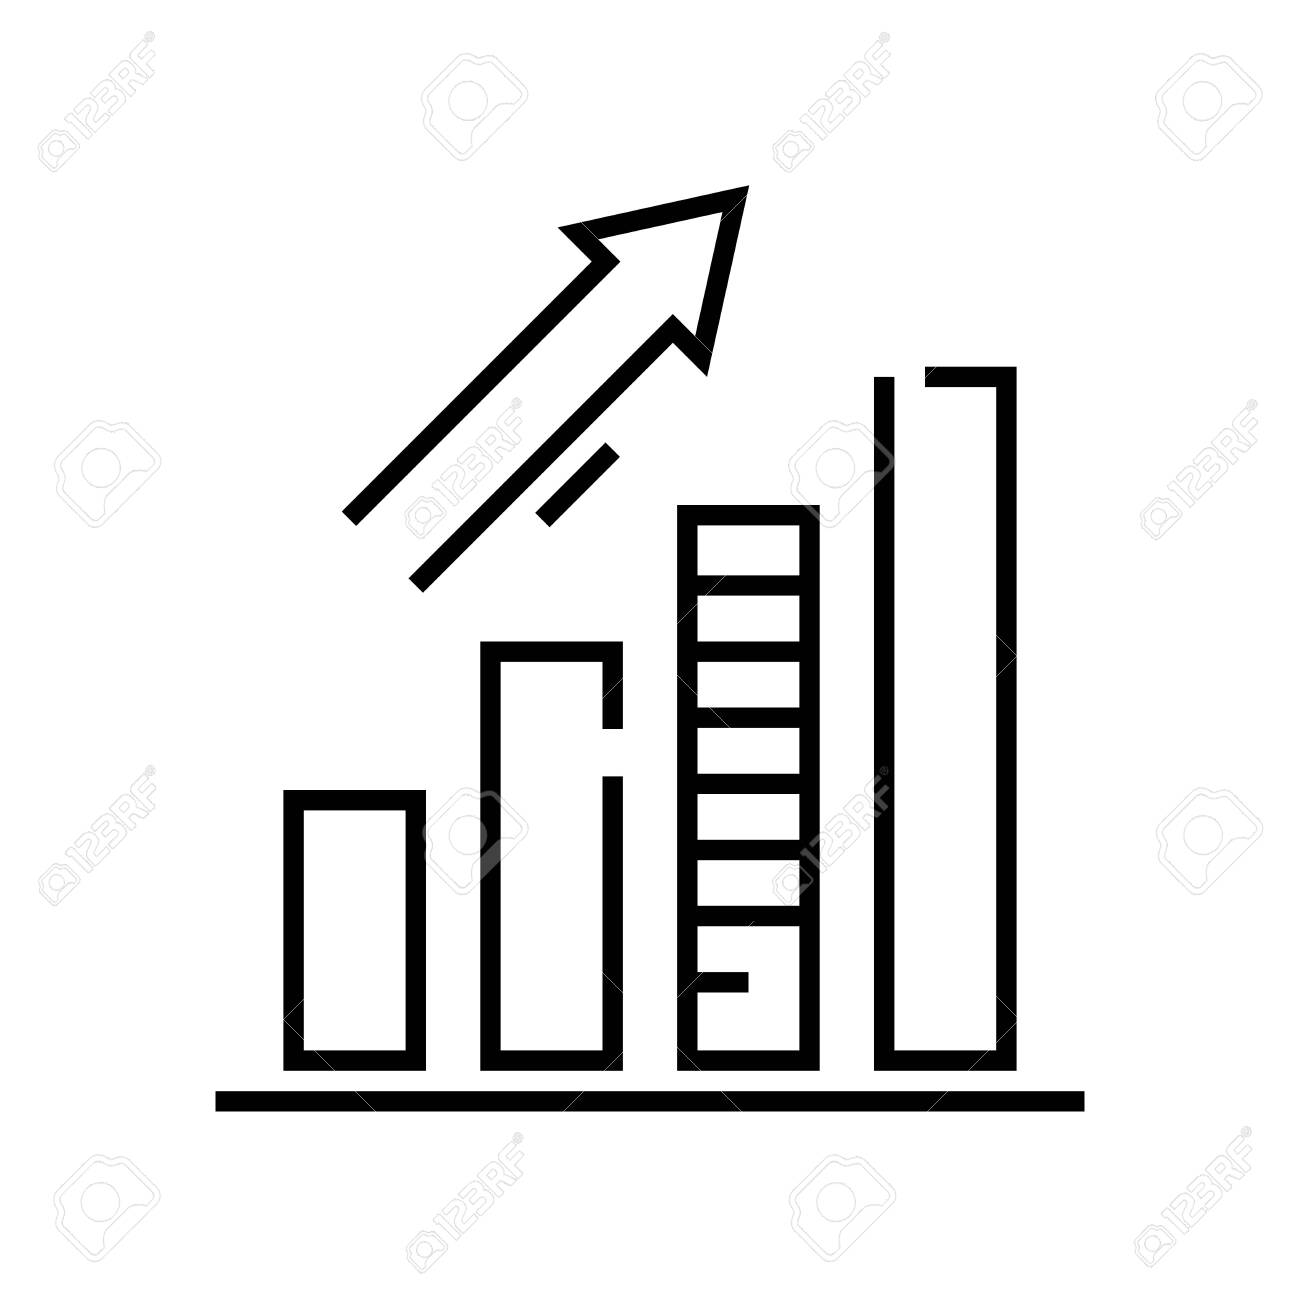 trend vonal koncepció